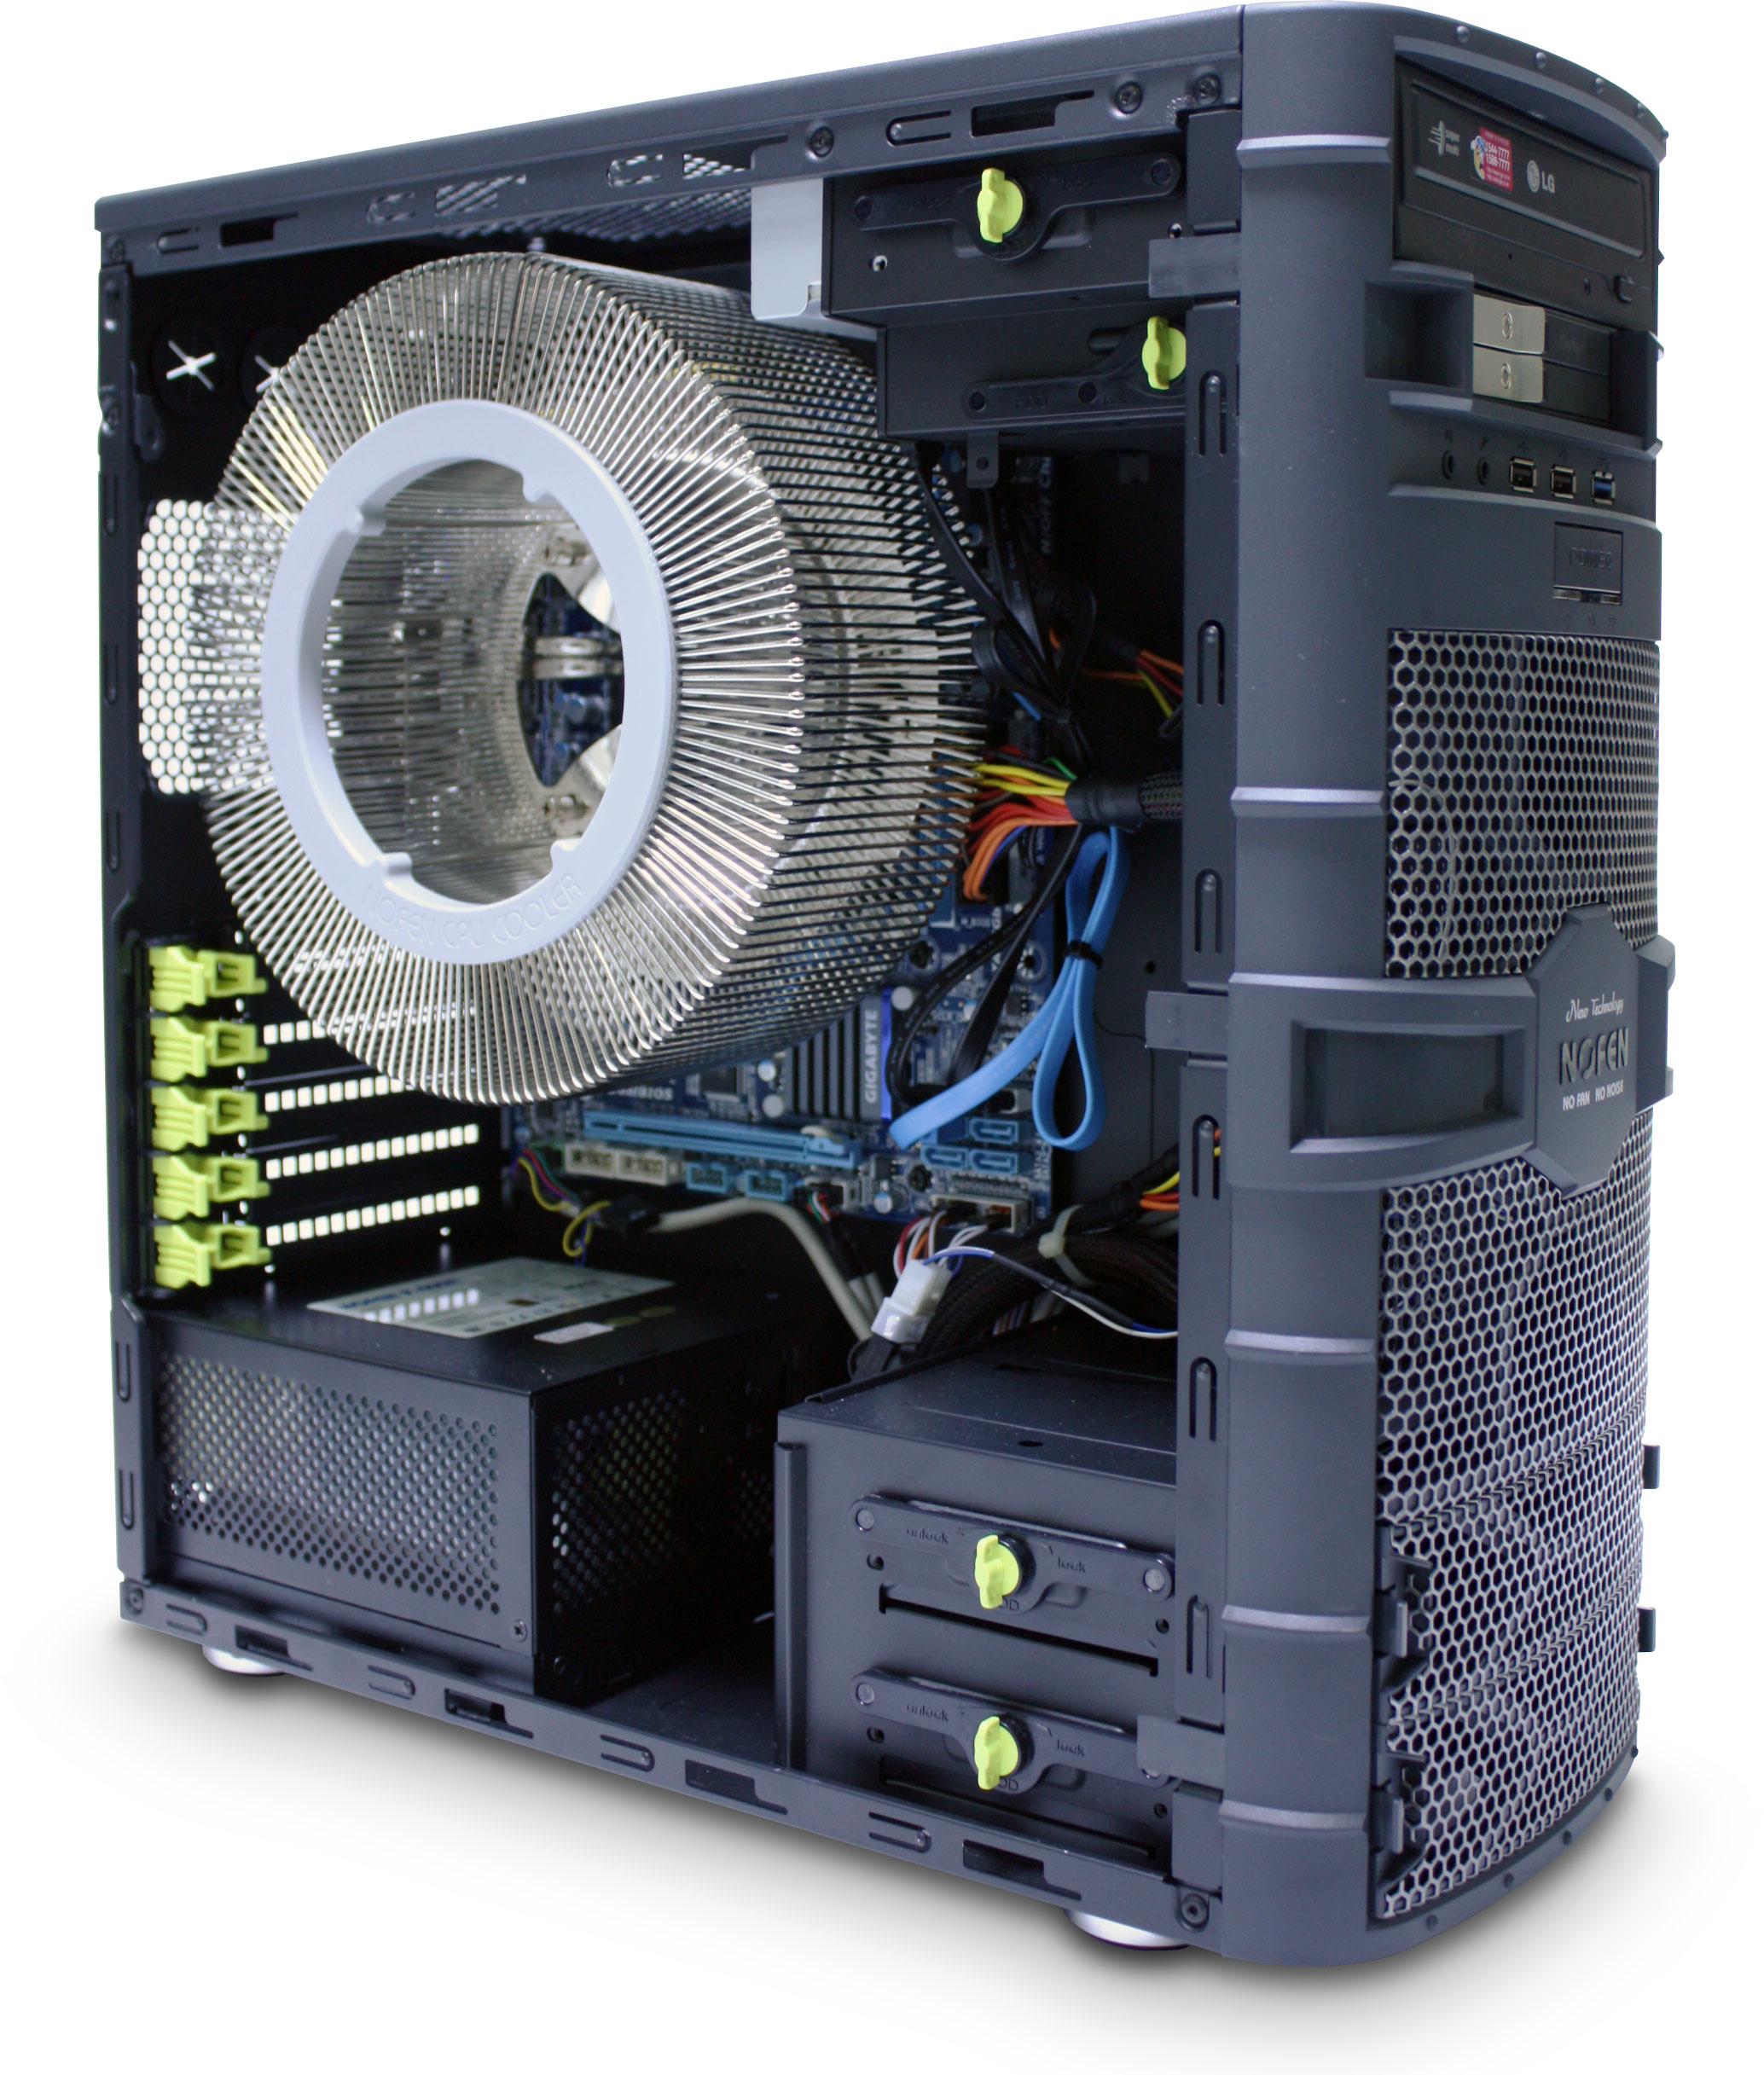 SET-A43 Fanless Bundle: CS-60 Case, 400W PSU and CPU Cooler